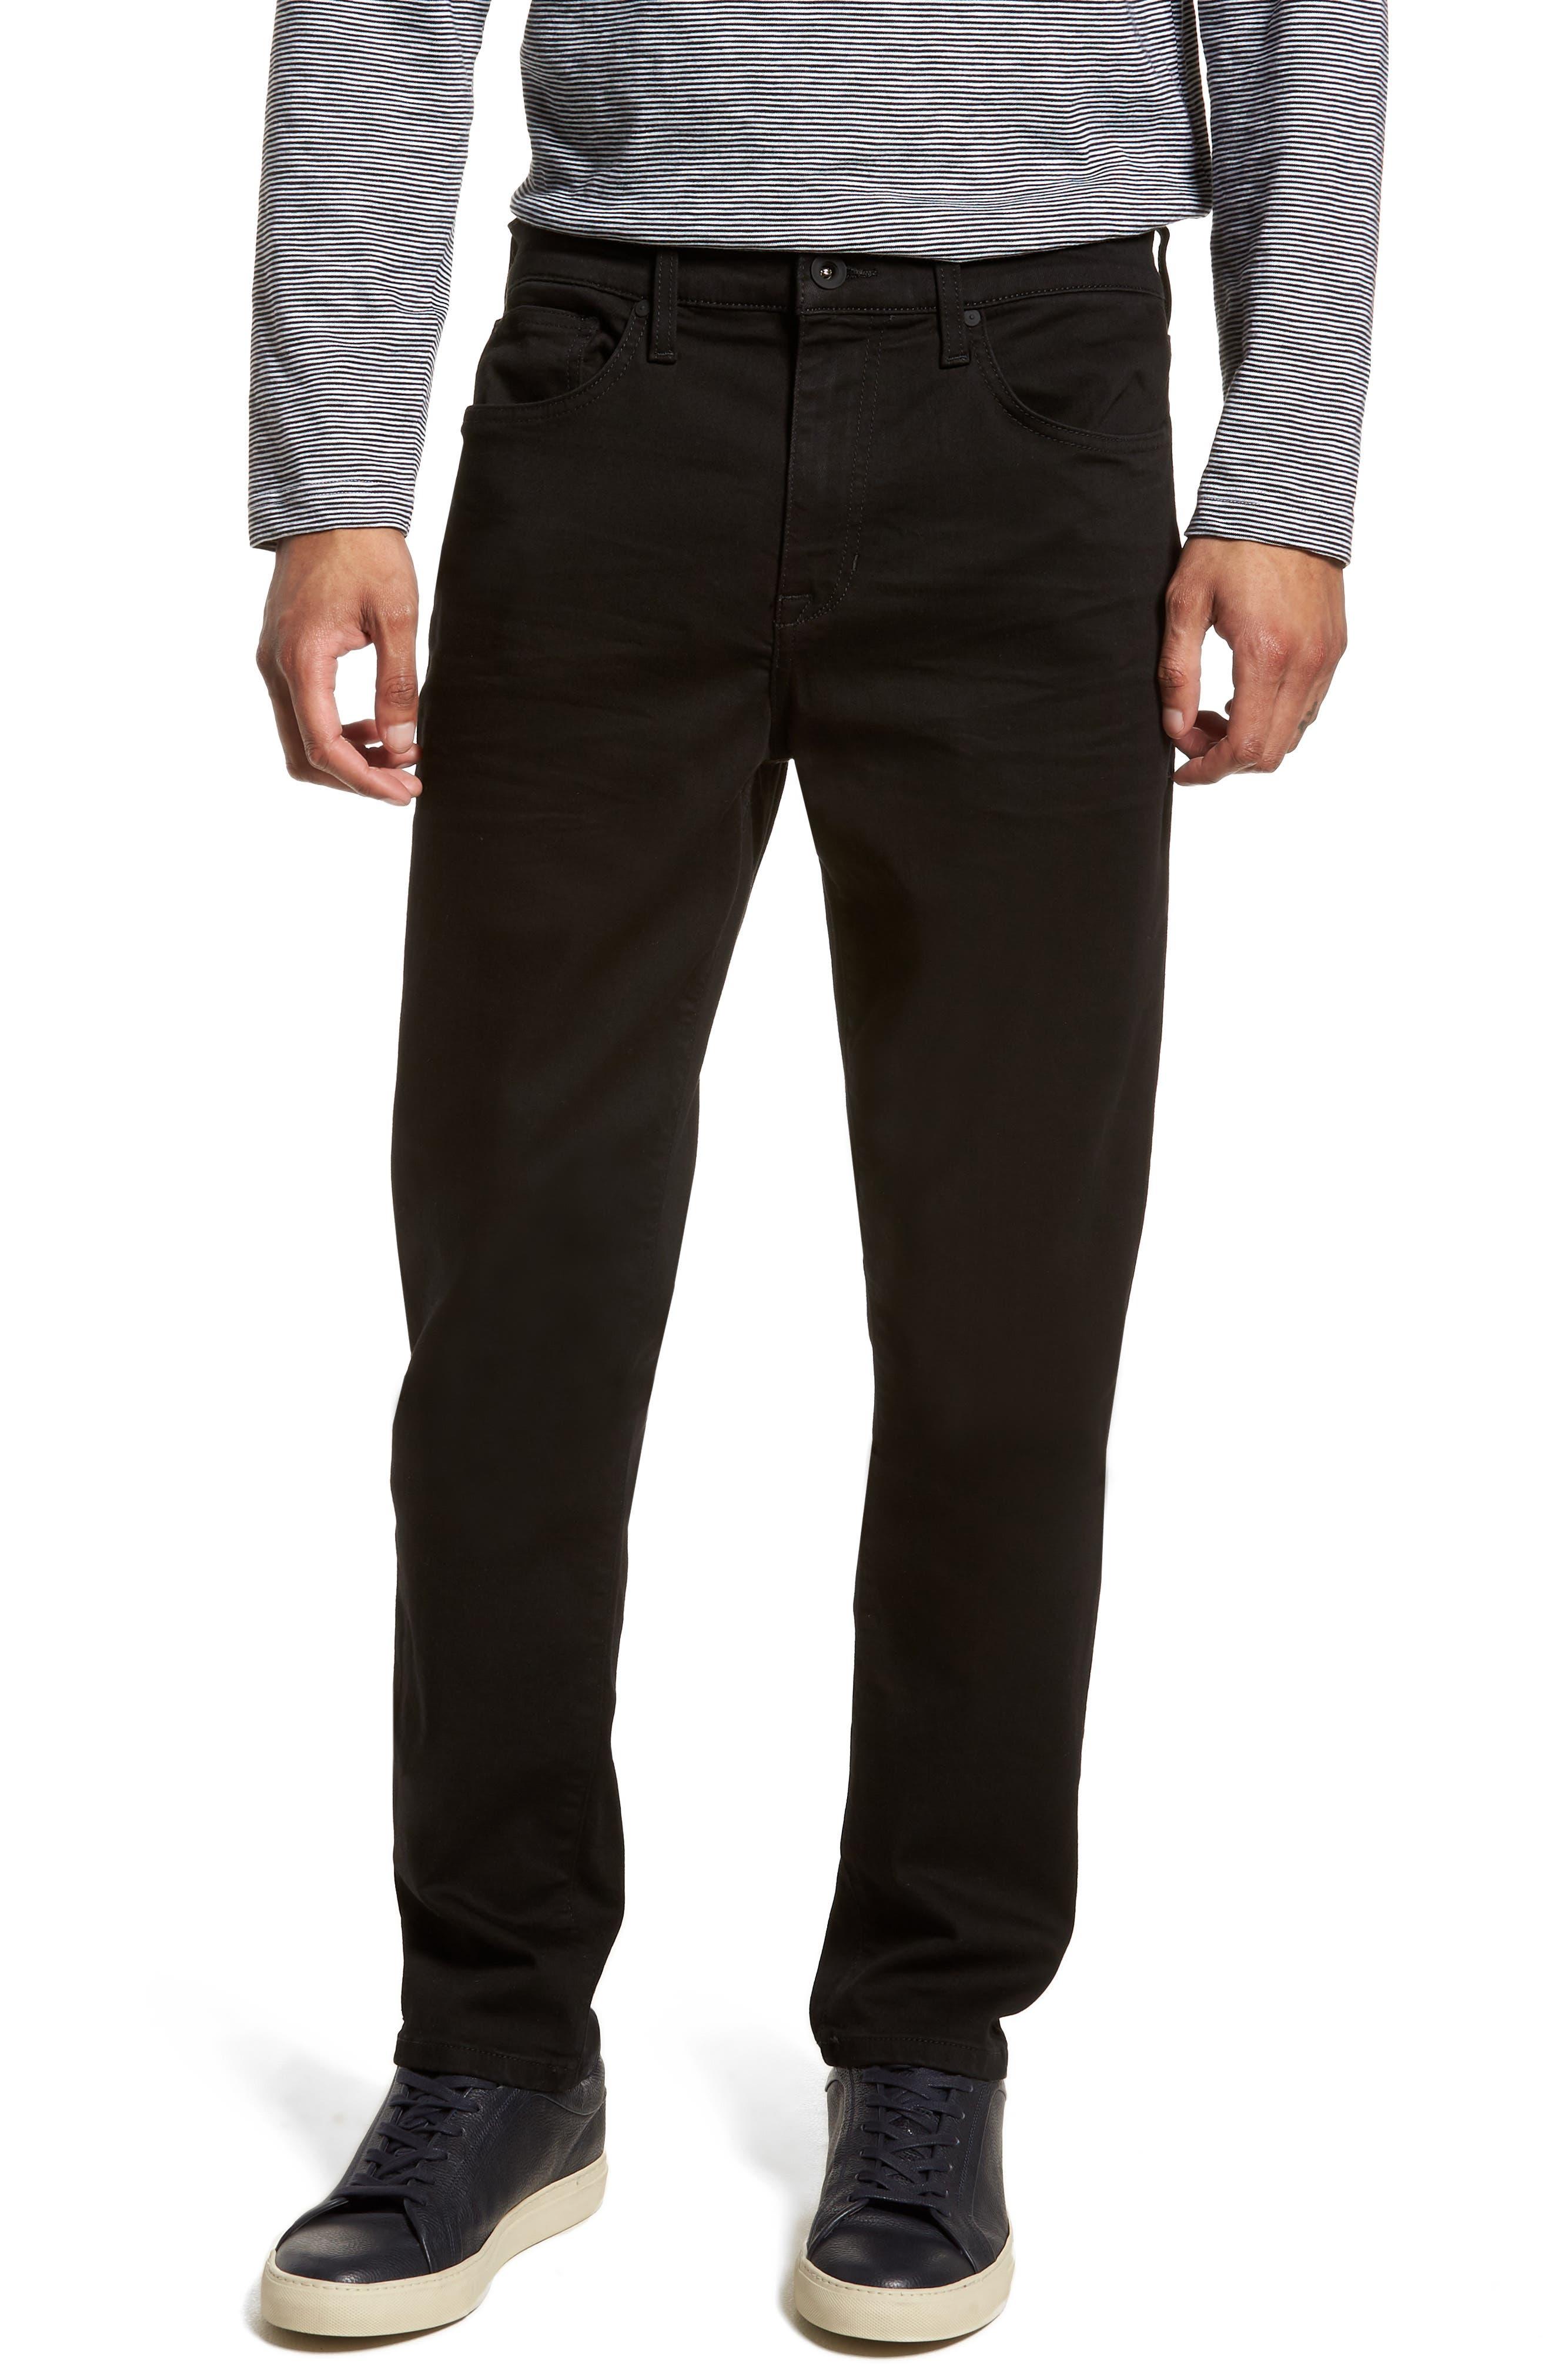 Folsom Athletic Slim Fit Jeans,                         Main,                         color, EDLEMAN